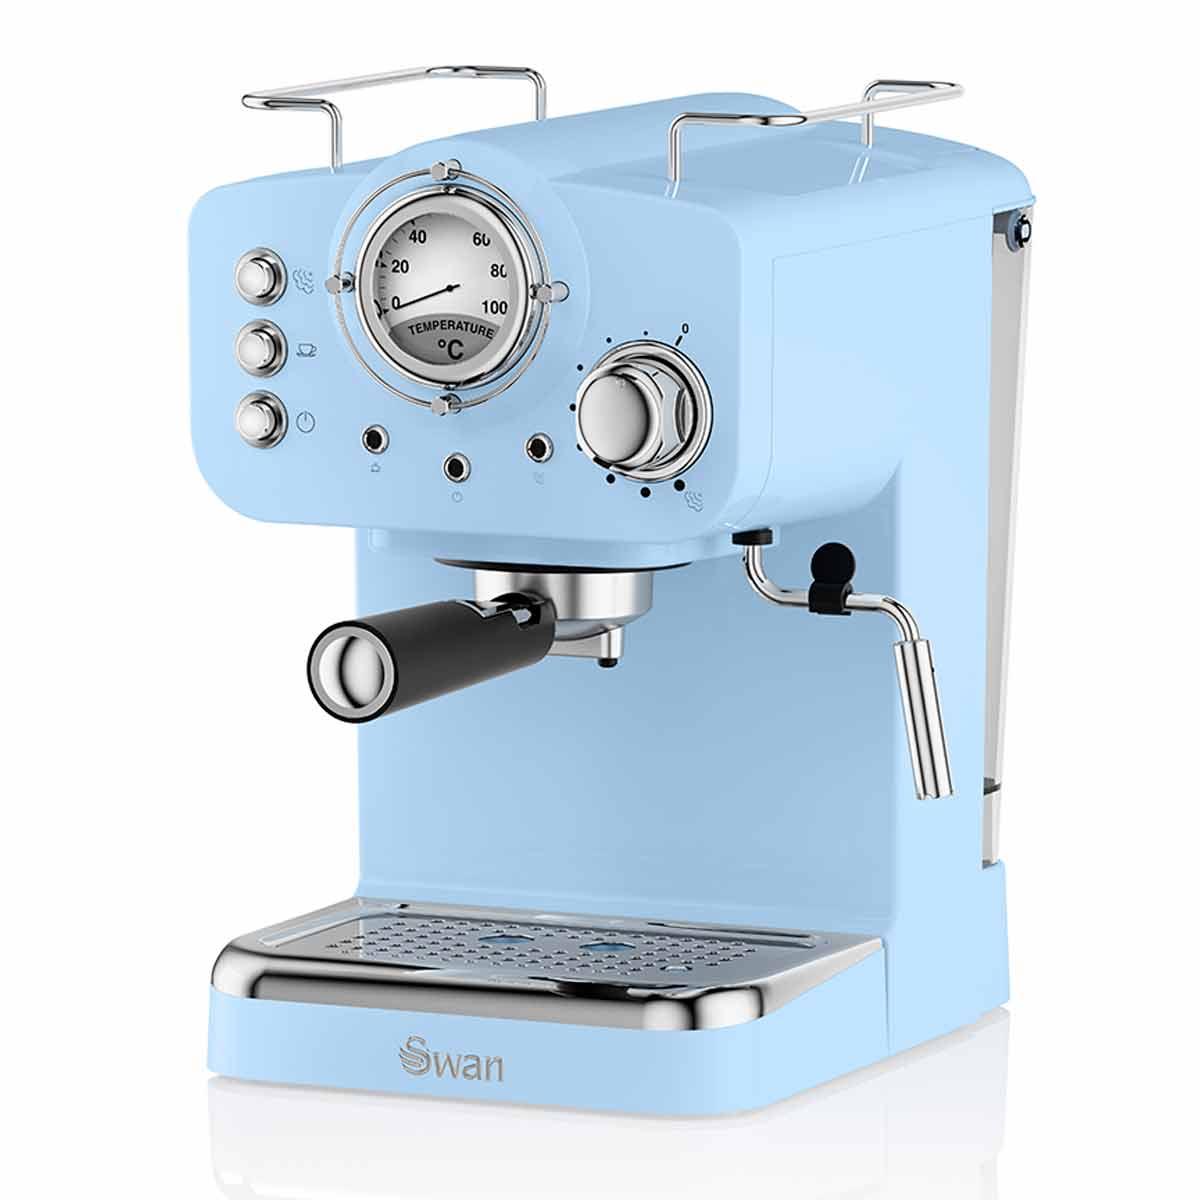 Swan Retro Espresso Coffee Machine, Blue